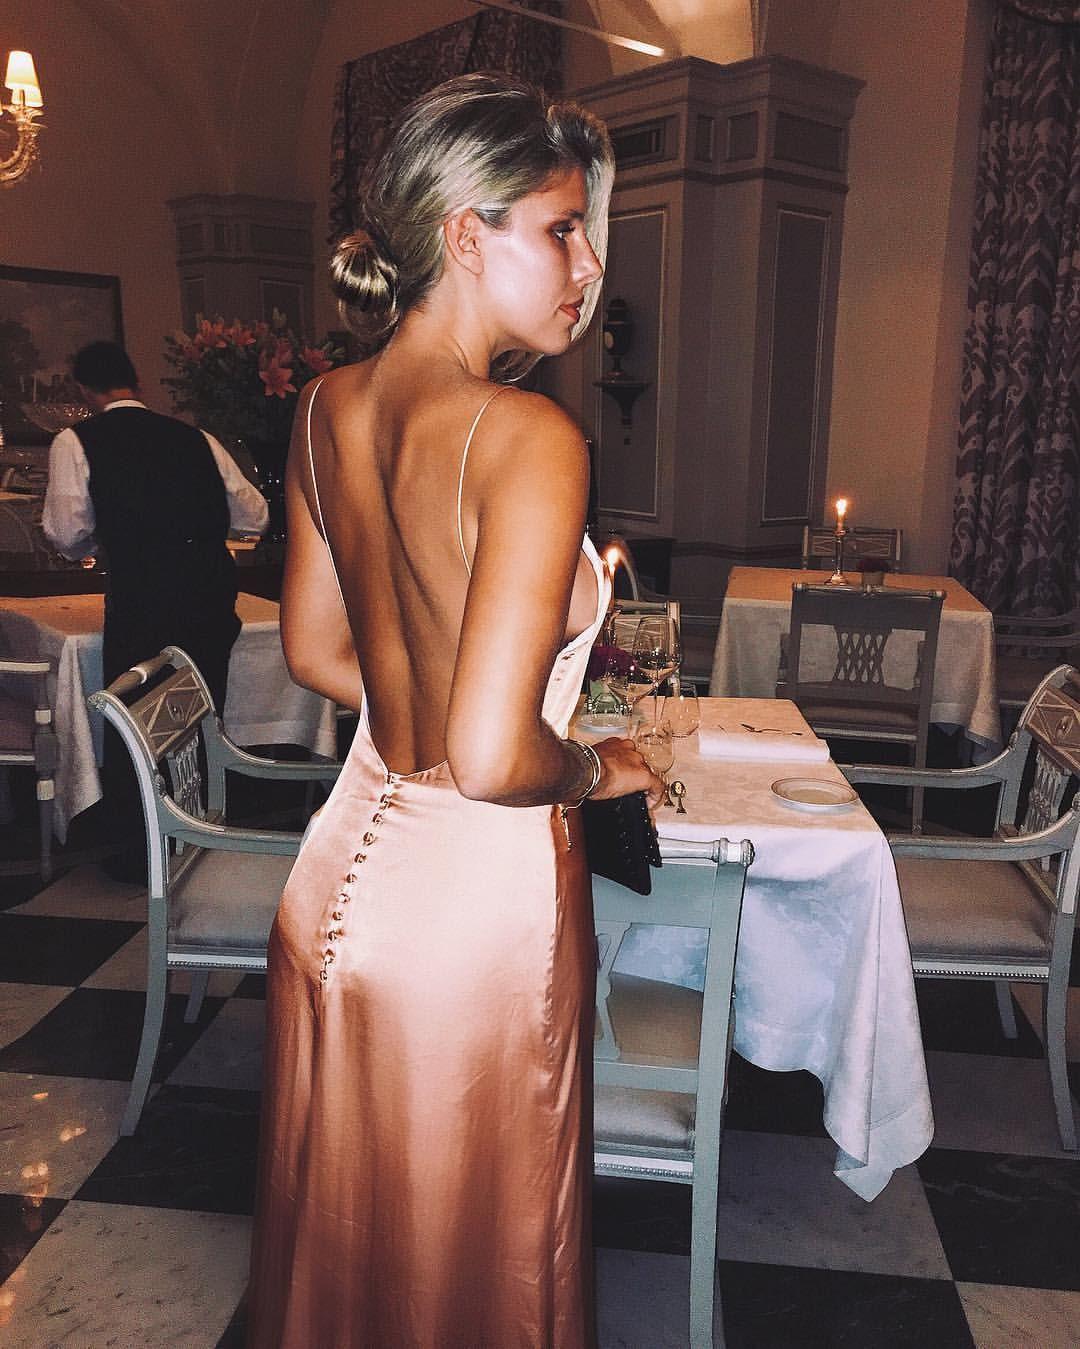 "a4f40223bb Natasha Oakley on Instagram: ""Silky nights in Florence wearing @Revolve  #REVOLVEaroundtheworld"""